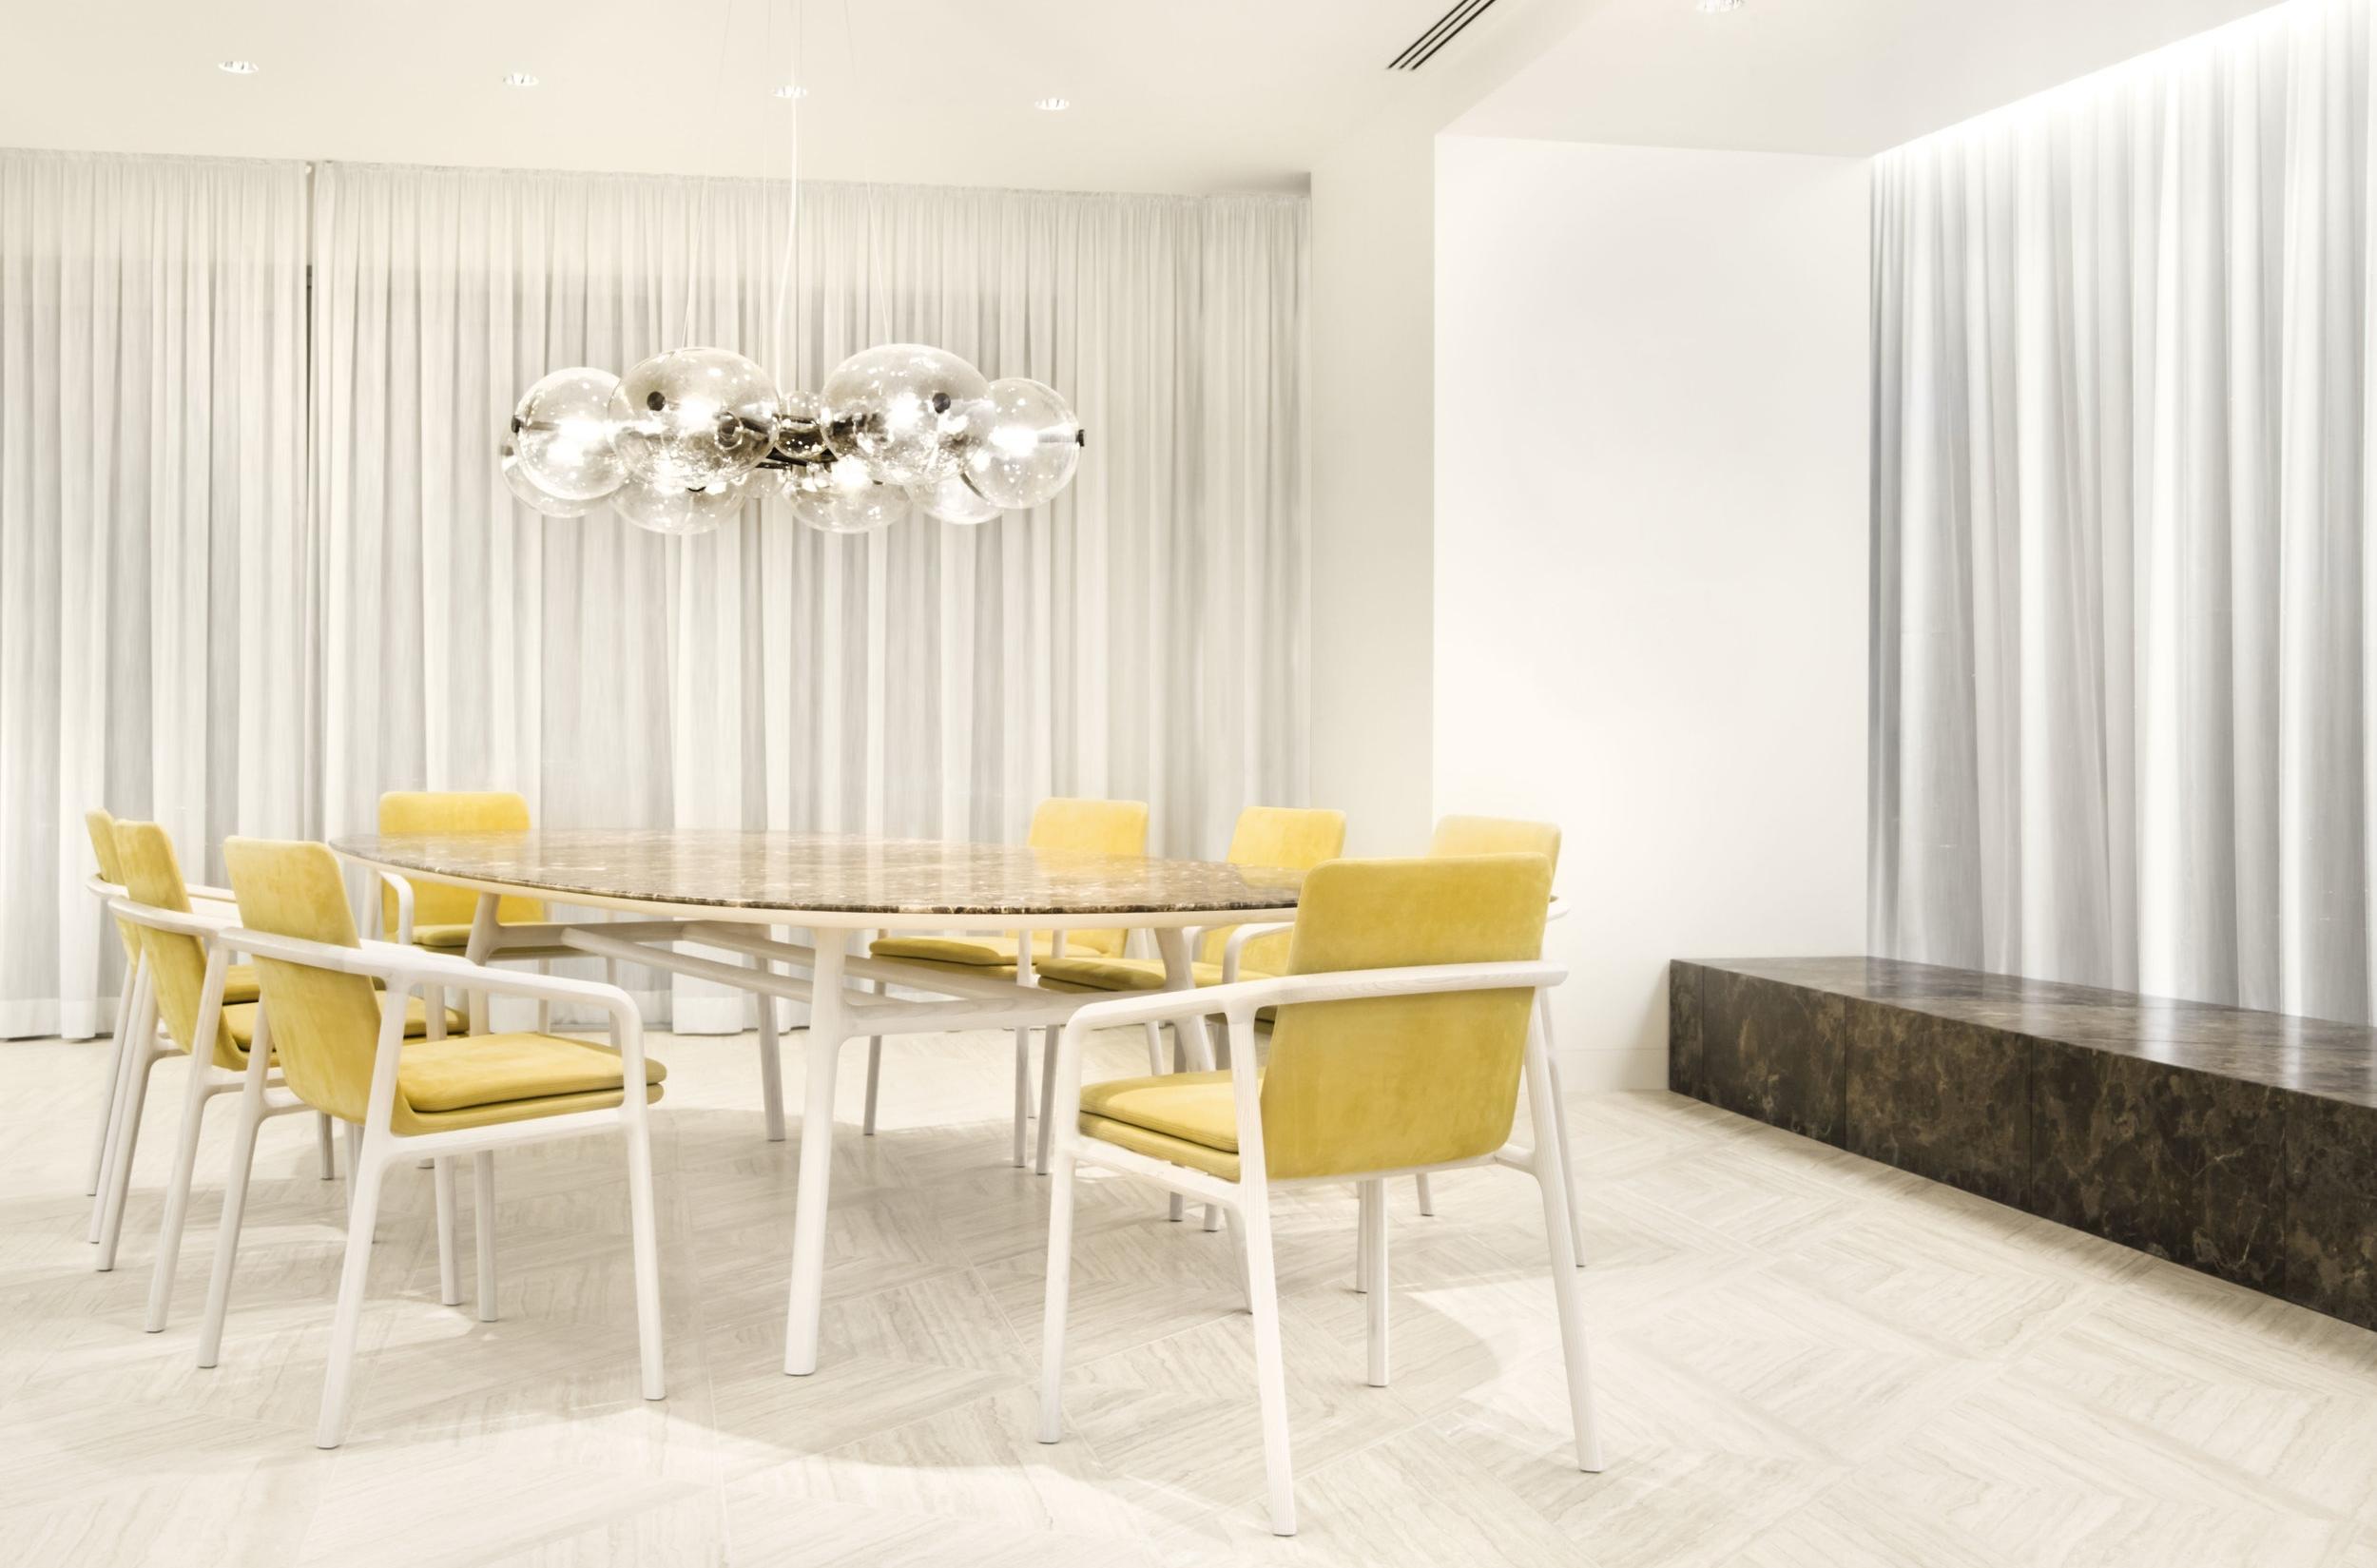 medeo-table_furniture-design_coordination-berlin_06.jpg